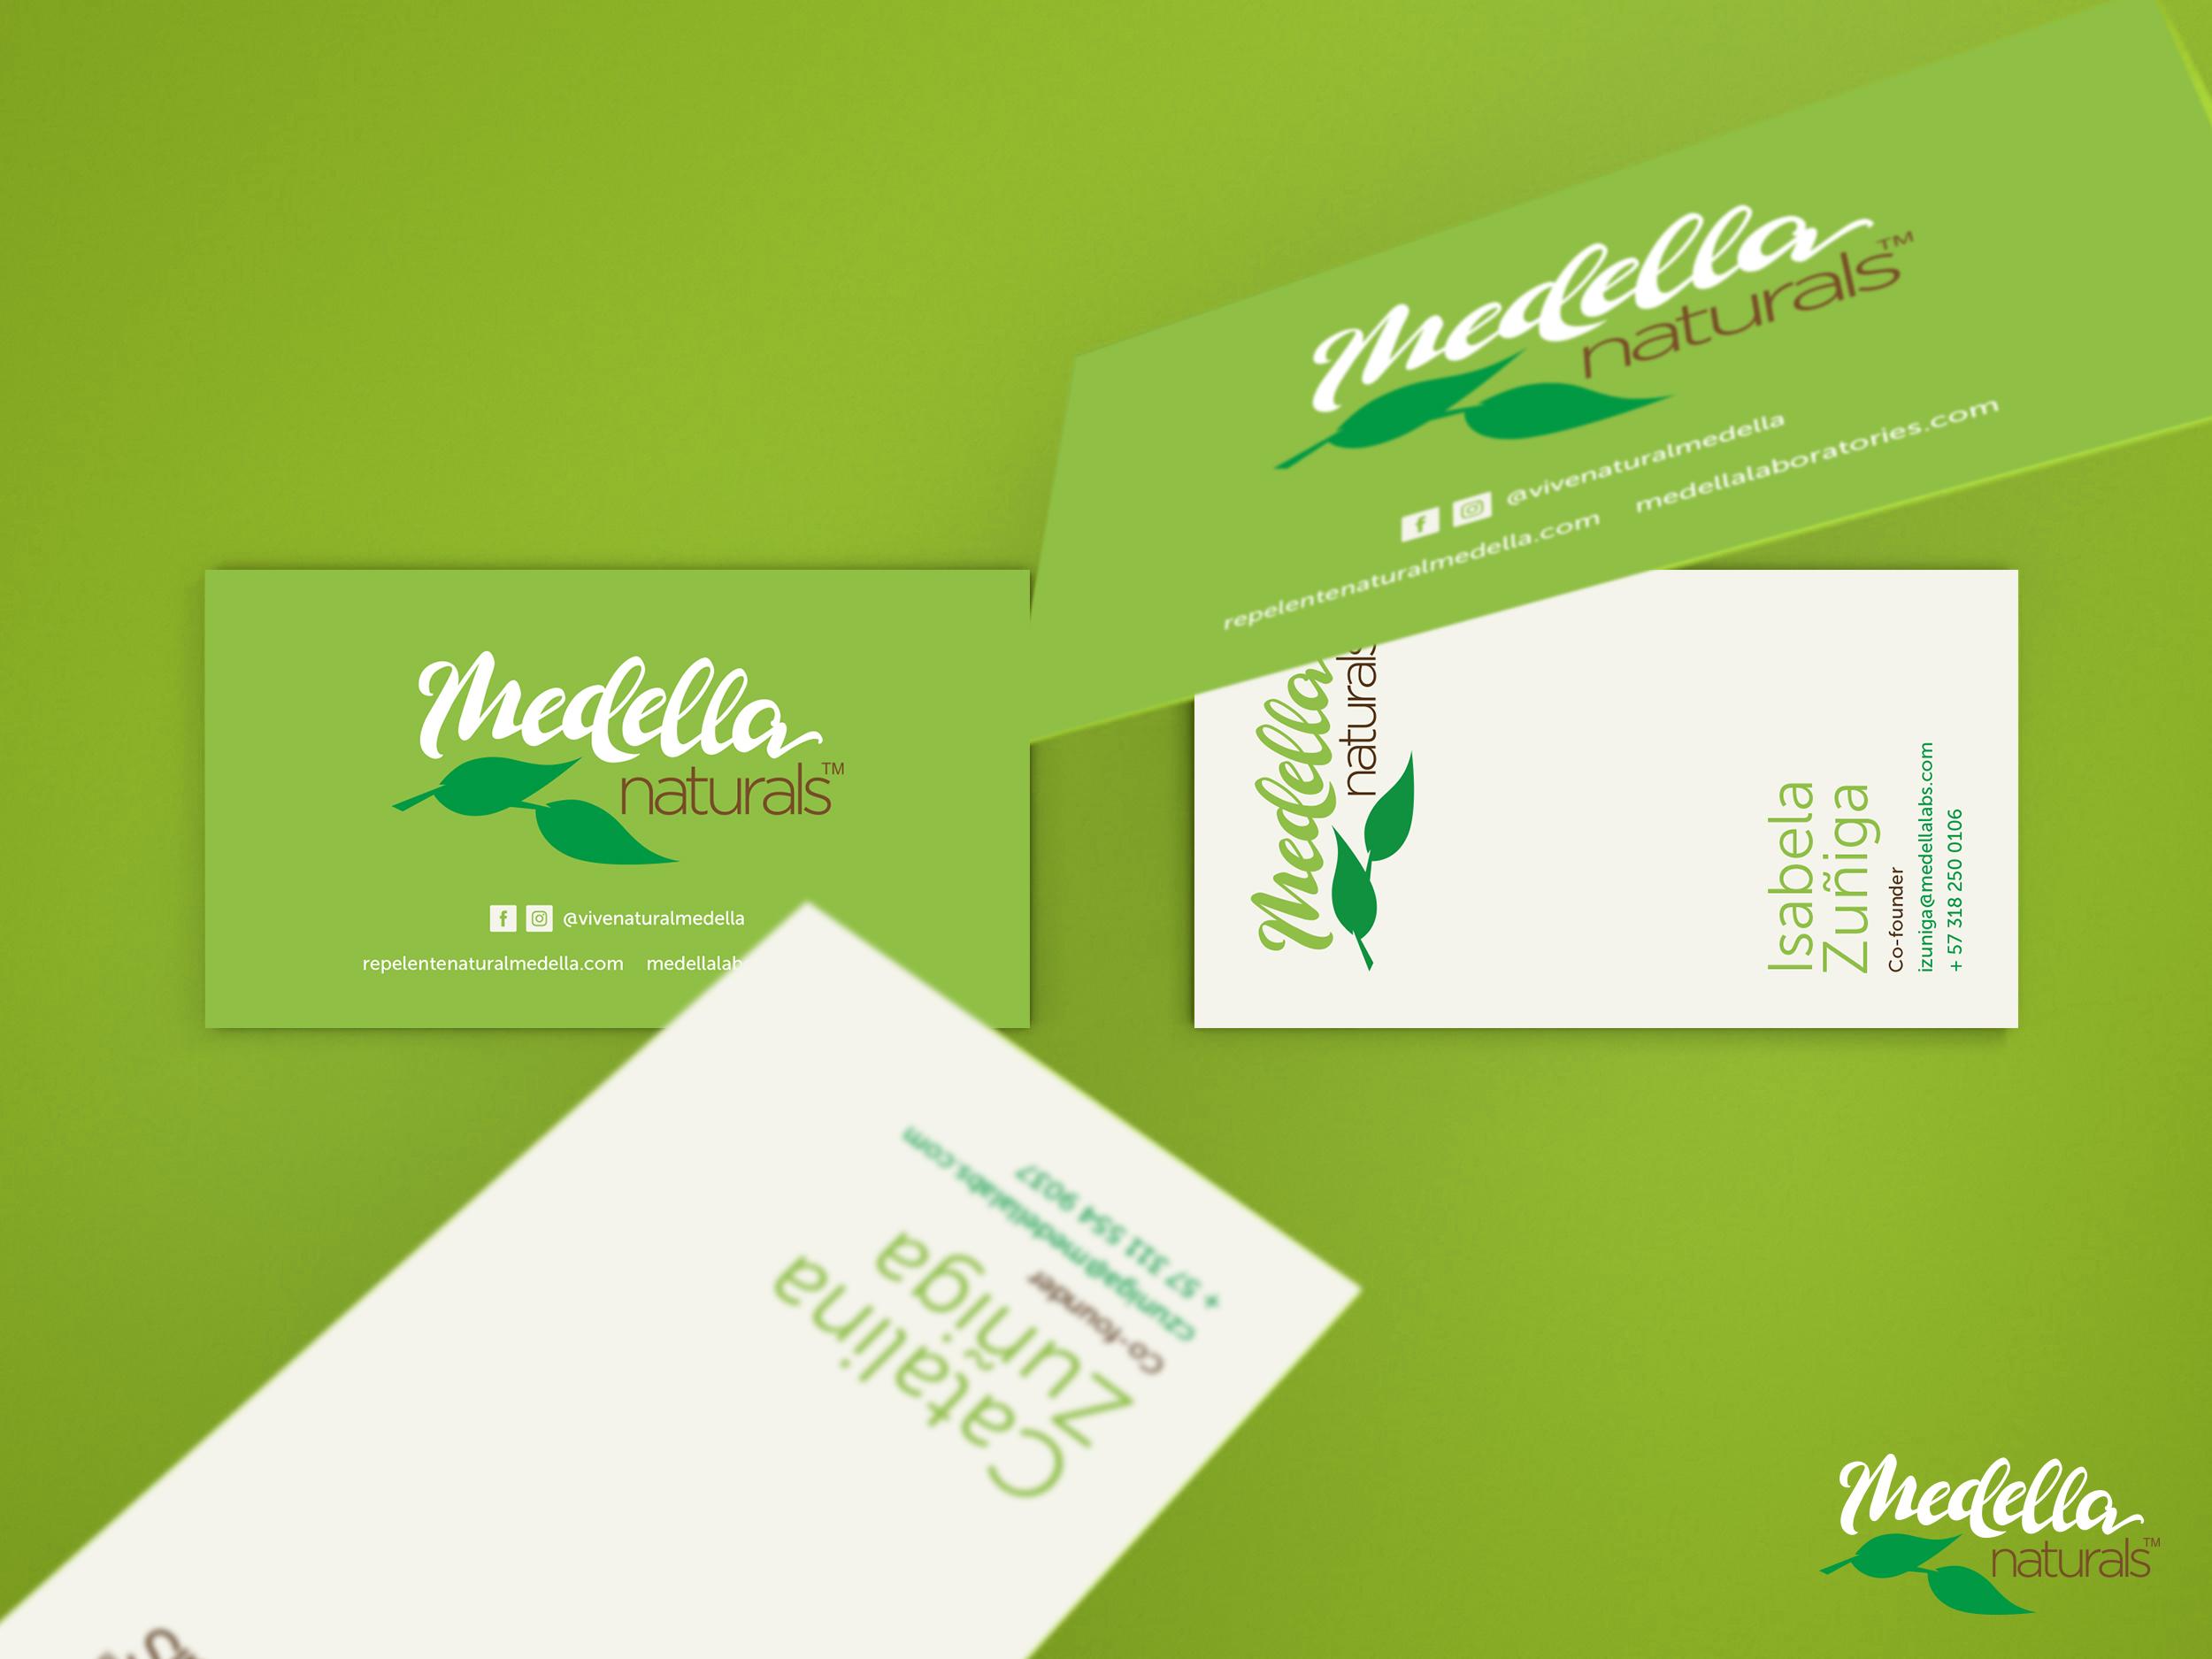 16_09_27_Tarjeta_de_Presentacion_Medella_Muestra_2